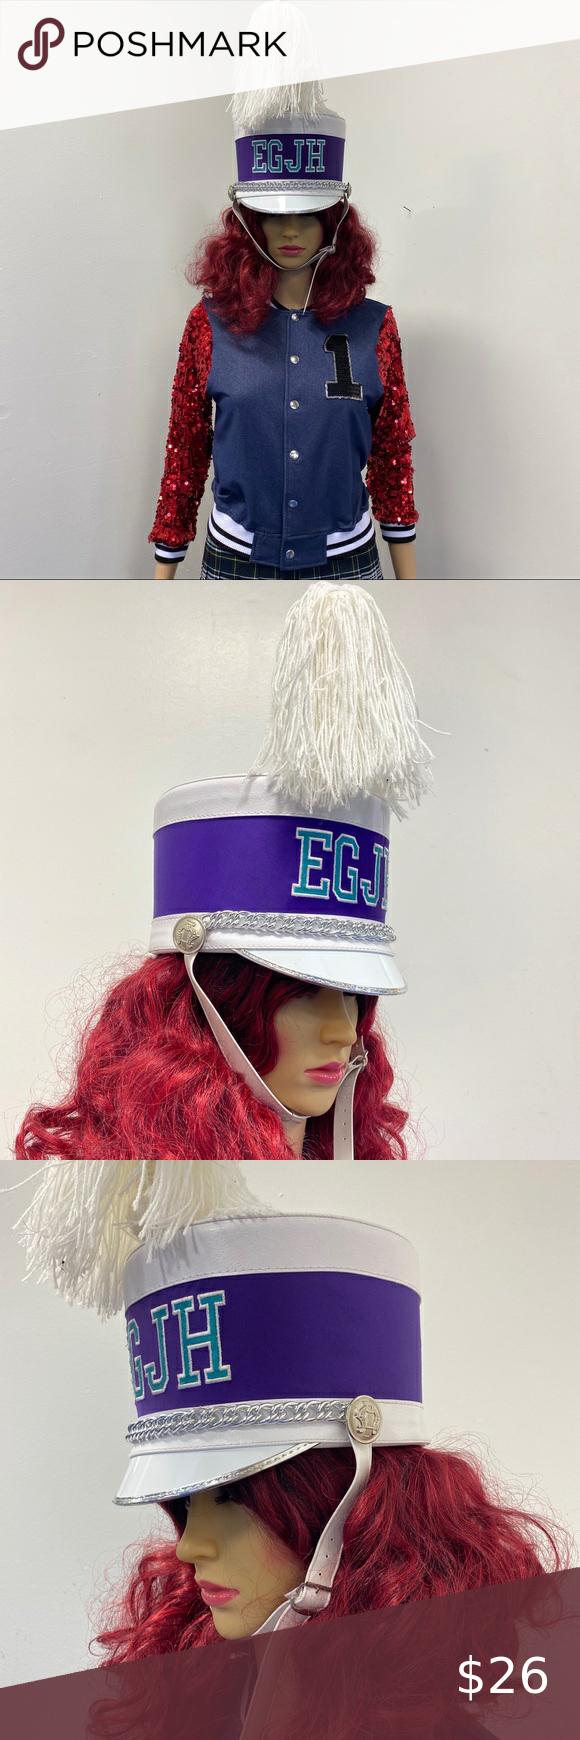 Vintage Marching Band Majorette Hat With Plume Costume Accessories Majorette Clothes Design